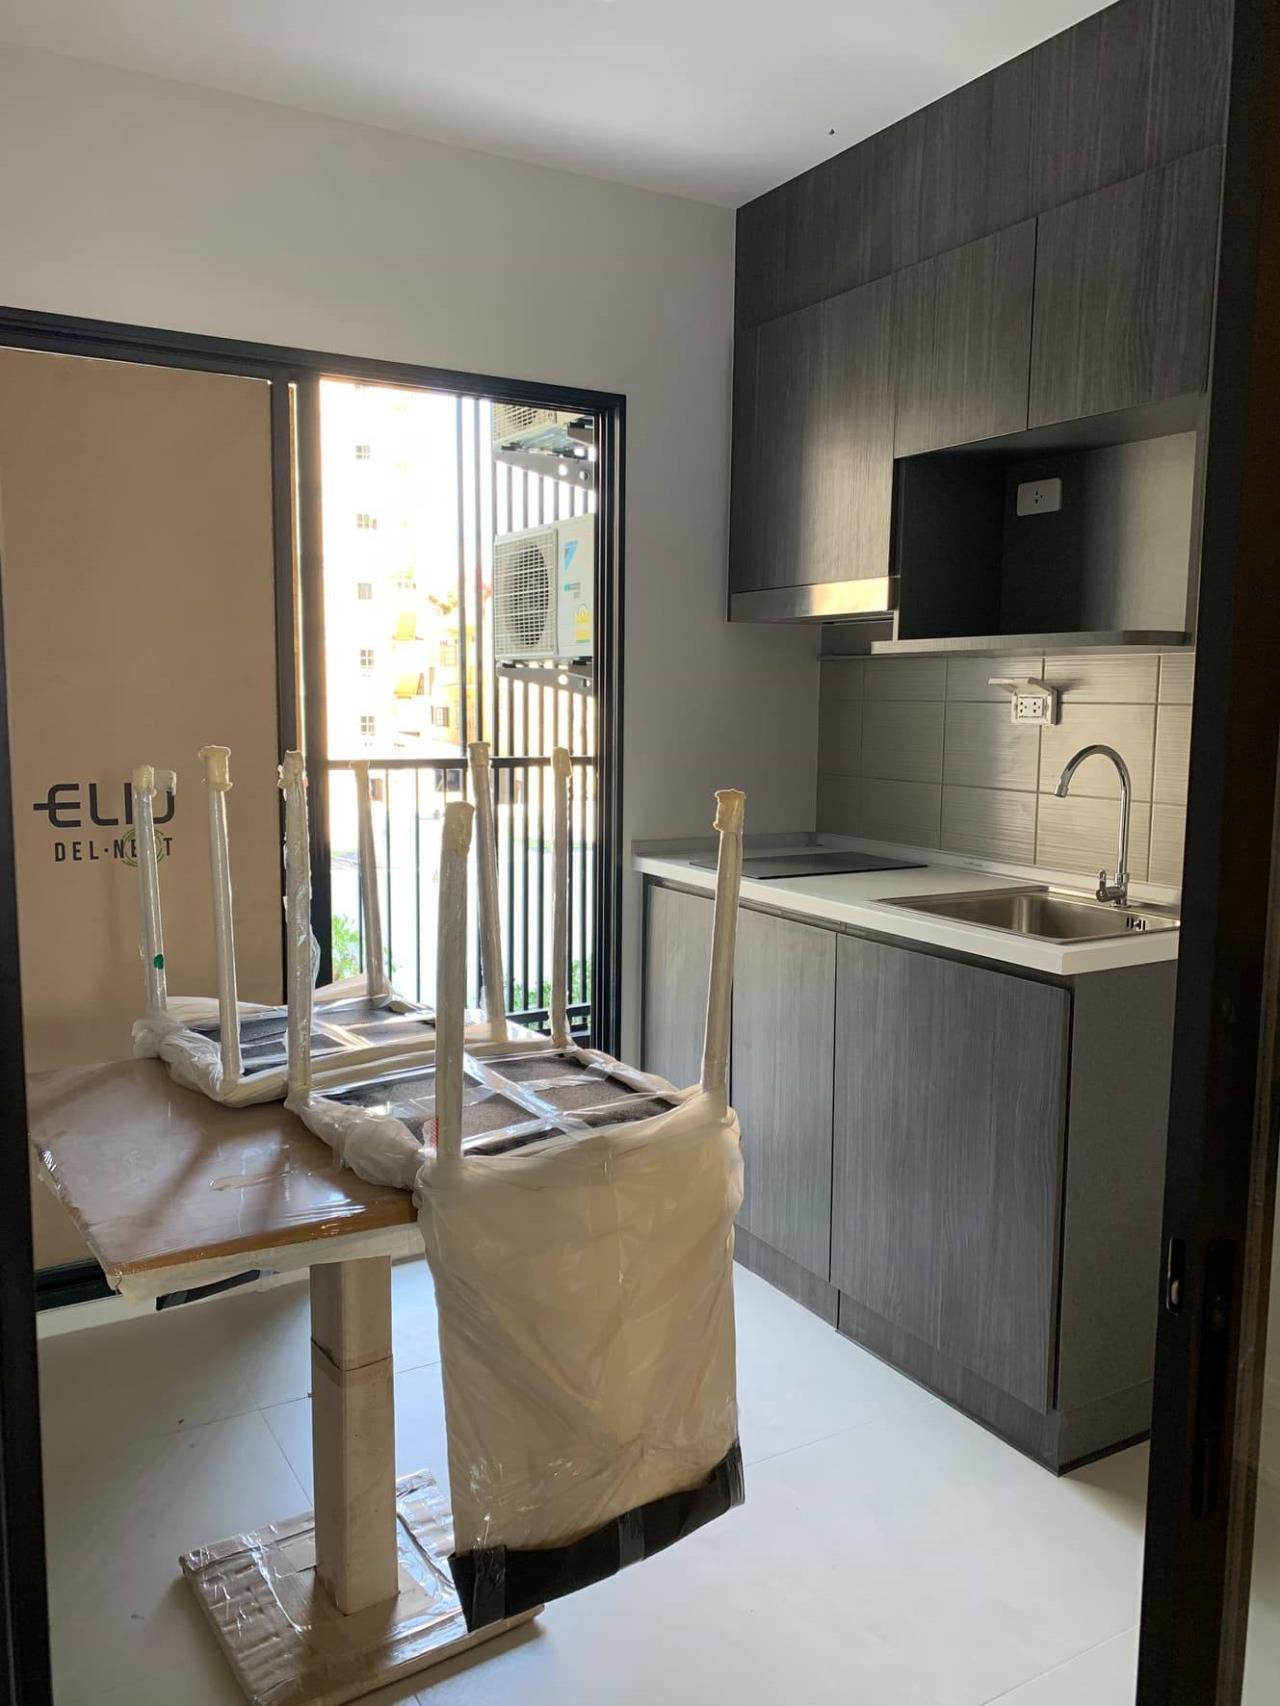 Blueocean property Agency's Condo For Rent – Elio Del Nest ( CODE : 20-06-0057-38 ) 11